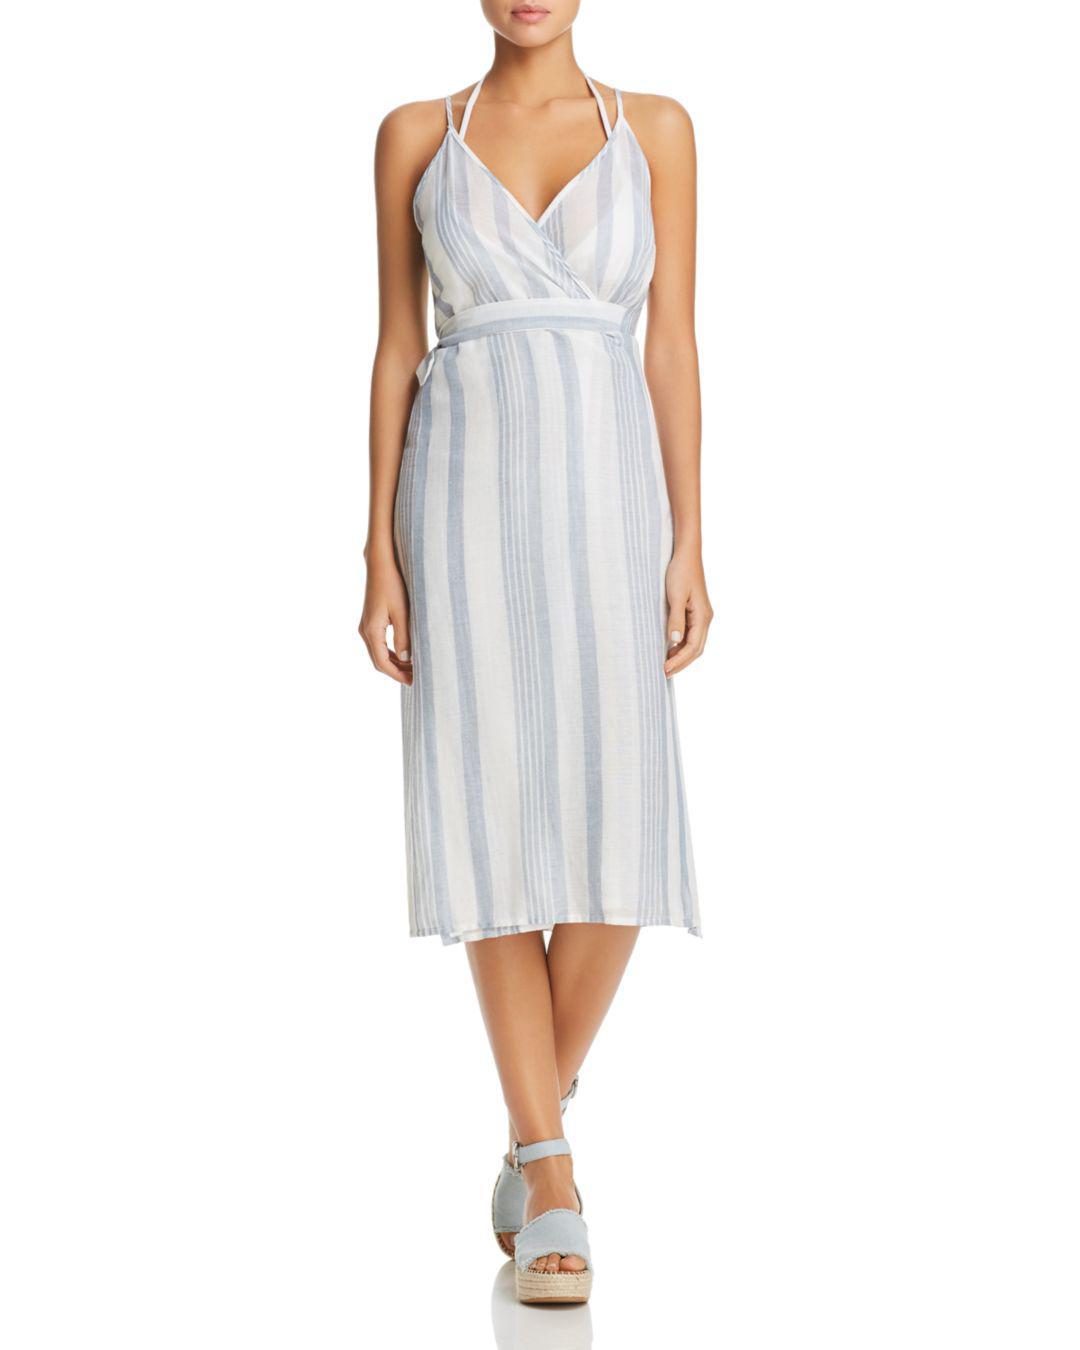 e04f012739 Lyst - J Valdi Sardinia Wrap Midi Dress Swim Cover-up in White